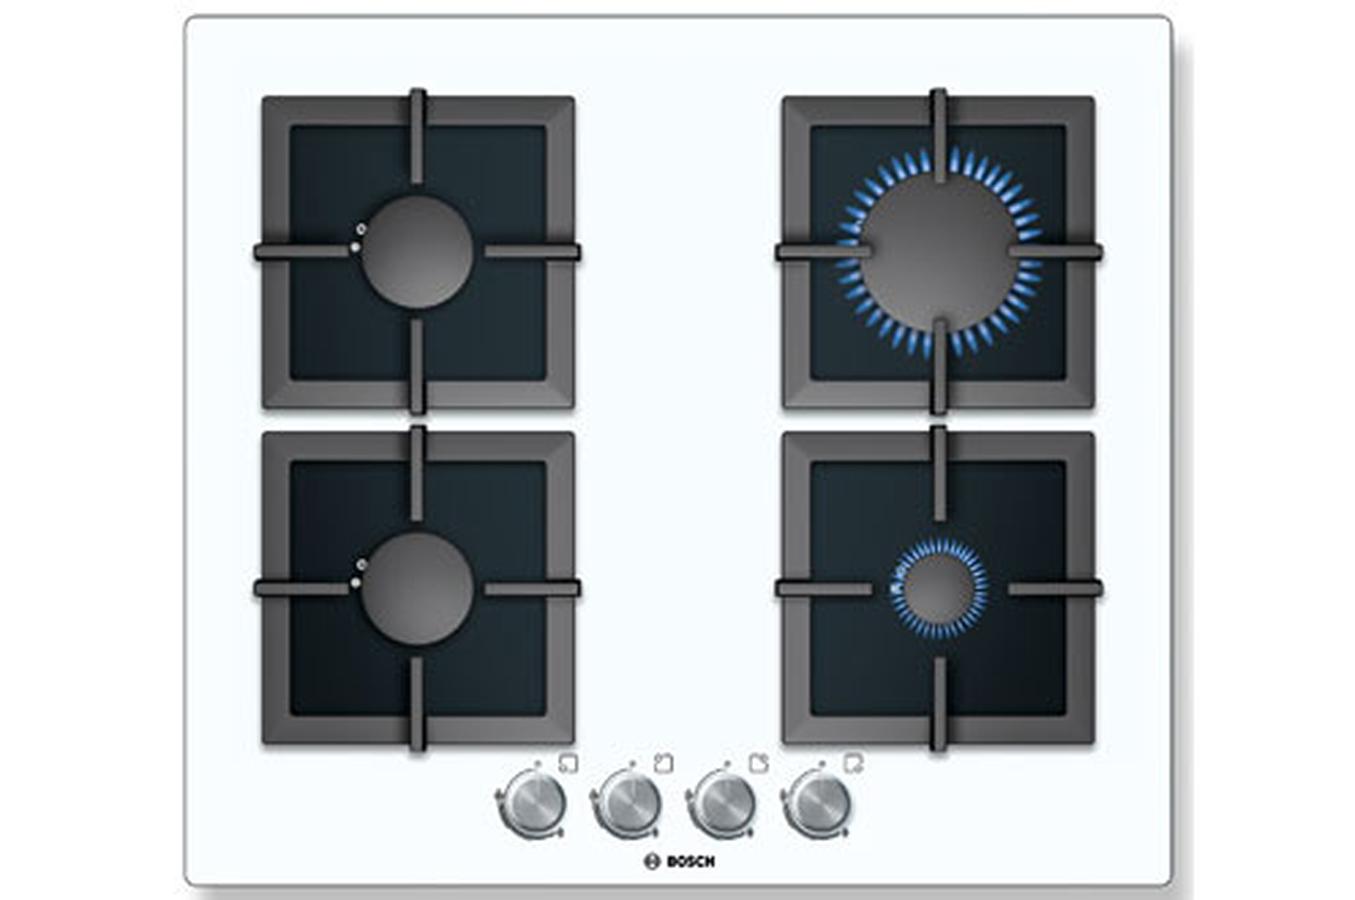 plaque gaz bosch ppp612b21e blanc ppp612b21e 3479153 darty. Black Bedroom Furniture Sets. Home Design Ideas